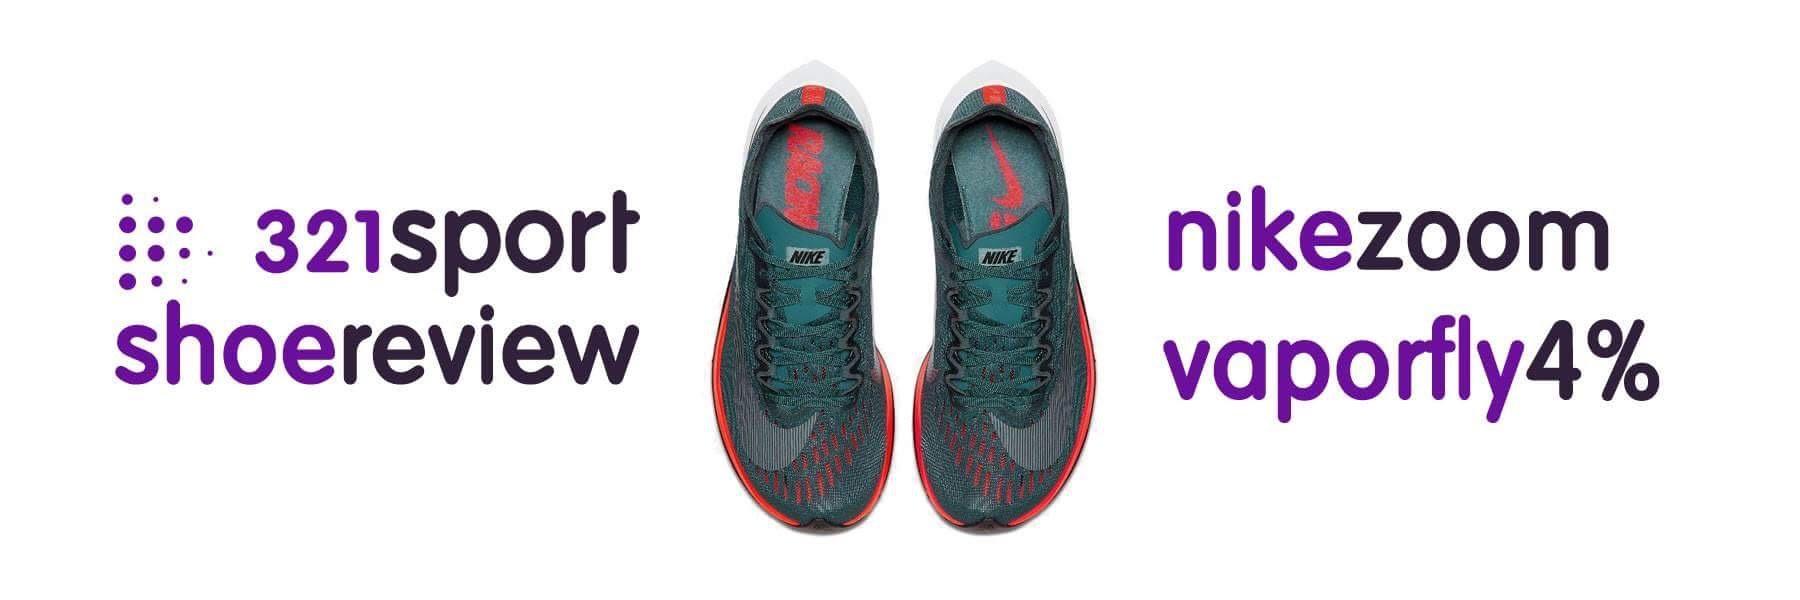 "Nike Zoom Vaporfly 4% și ""It's my life"" – cel mai rapid pantof din lume"